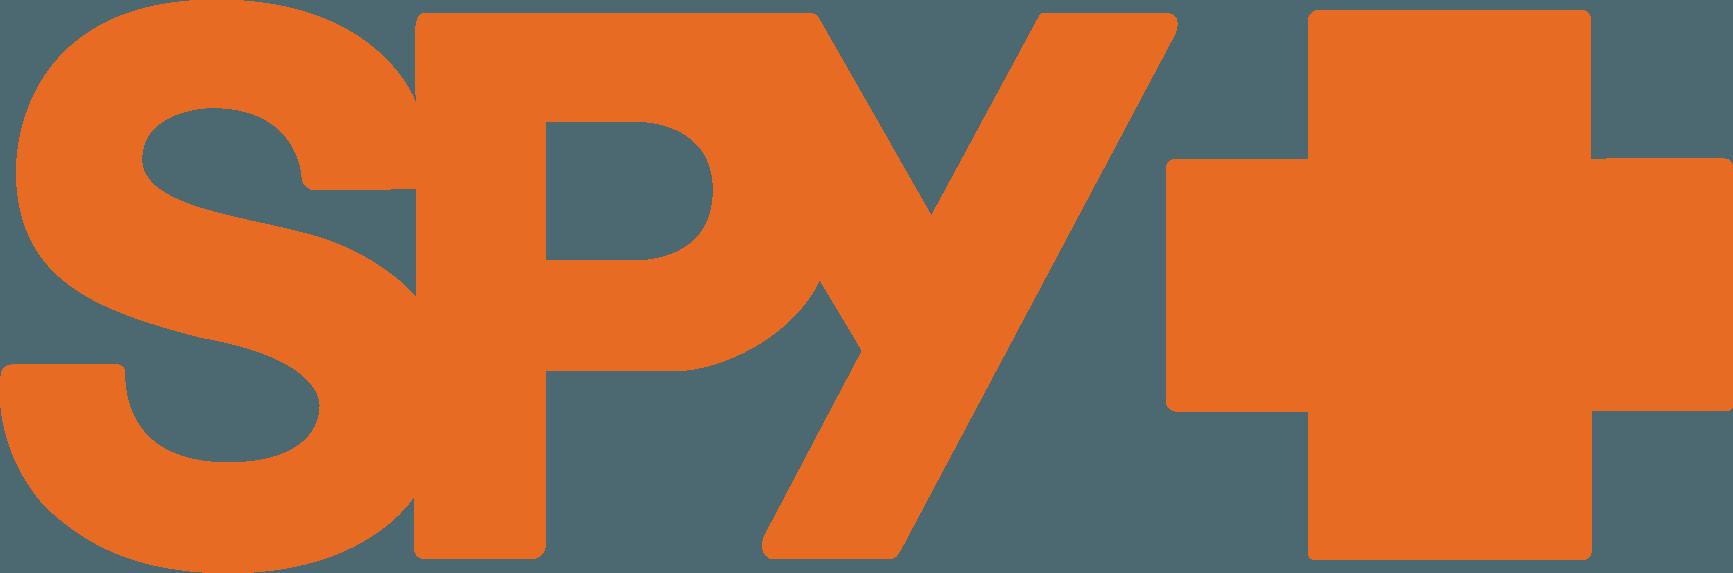 Spy Logo (Optic) png